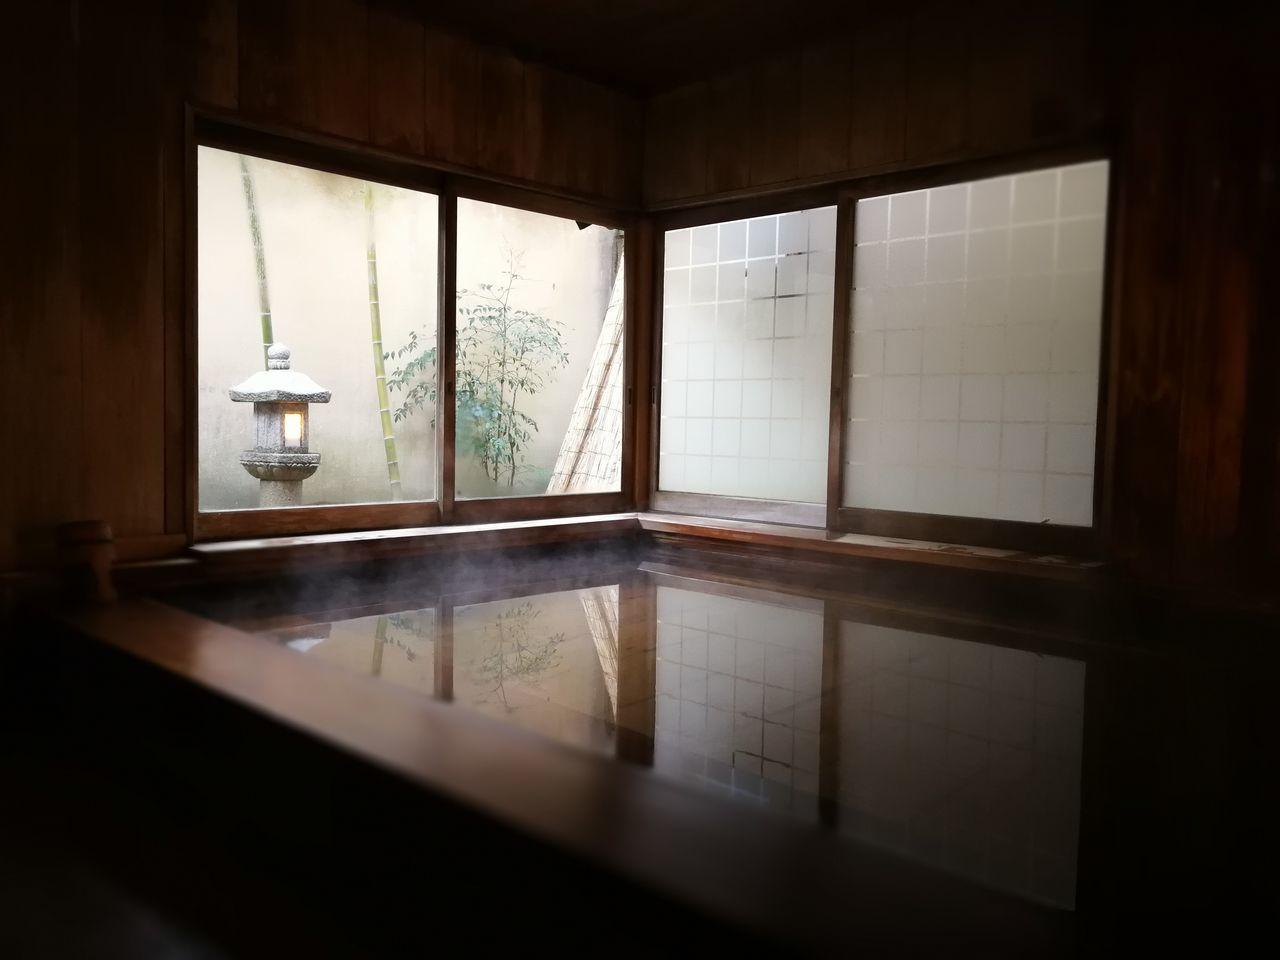 Bathtub Cypress Bath Day Hot Spring Indoors  Innocence Japanese  Japanese Bath Mindfulness No People Onsen Ryokan Scenics Spa Travel Window Zen